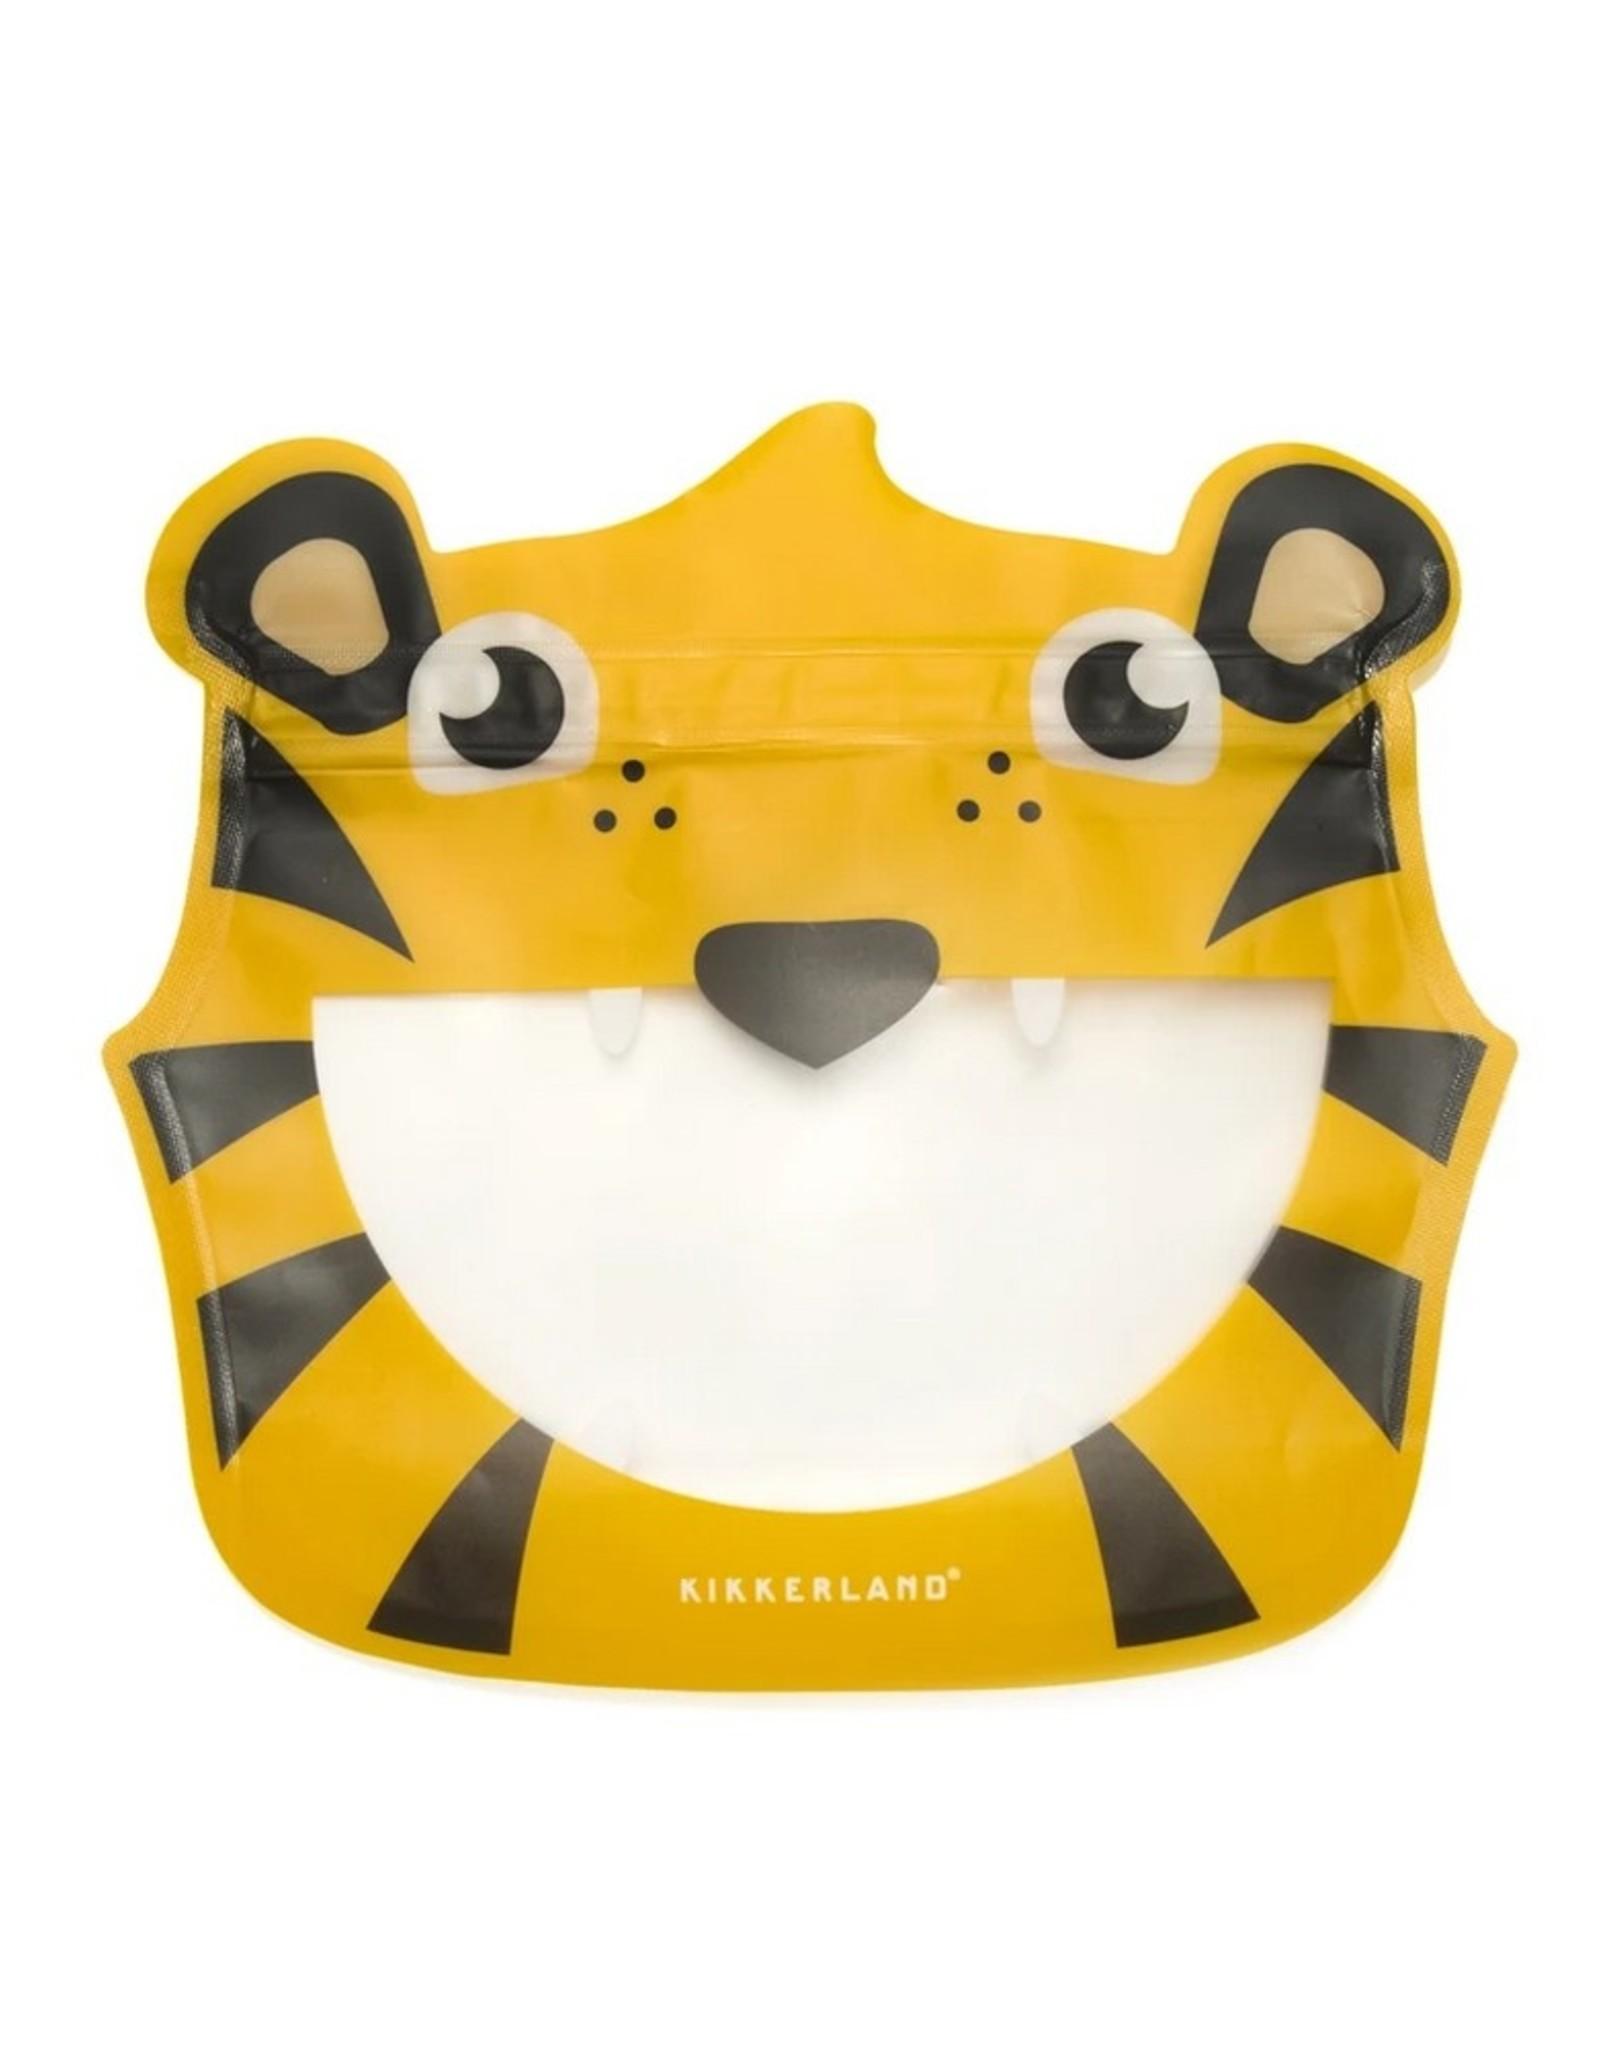 Kikkerland Zipper Bags Tiger 3 stuks